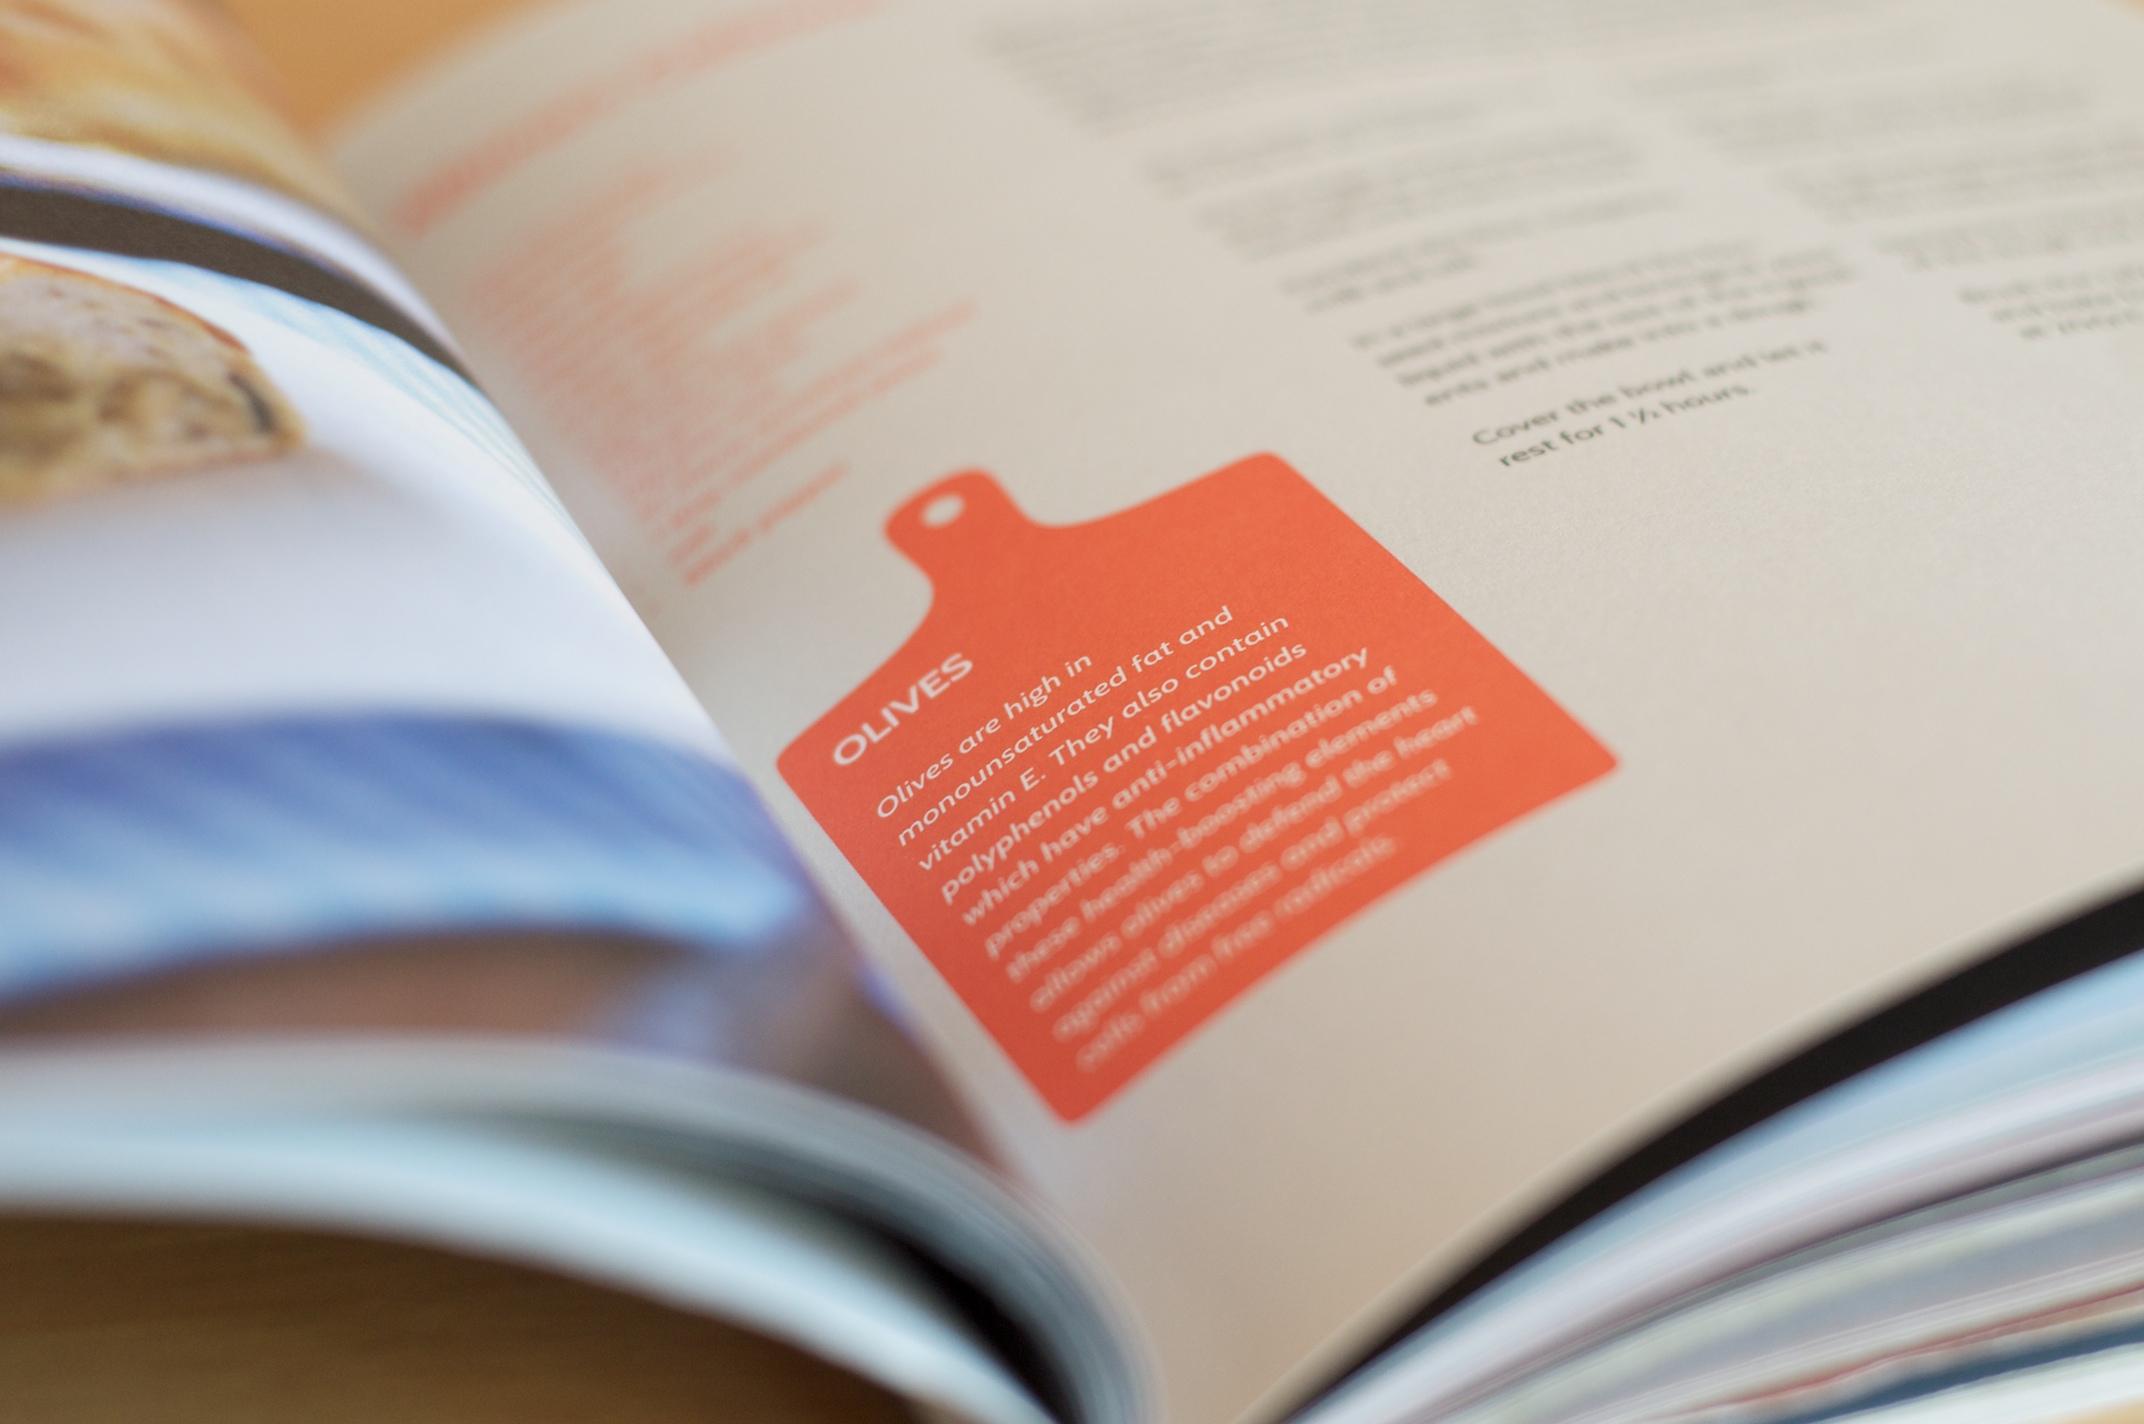 Vanessa's cookbook is full of nutrition advice